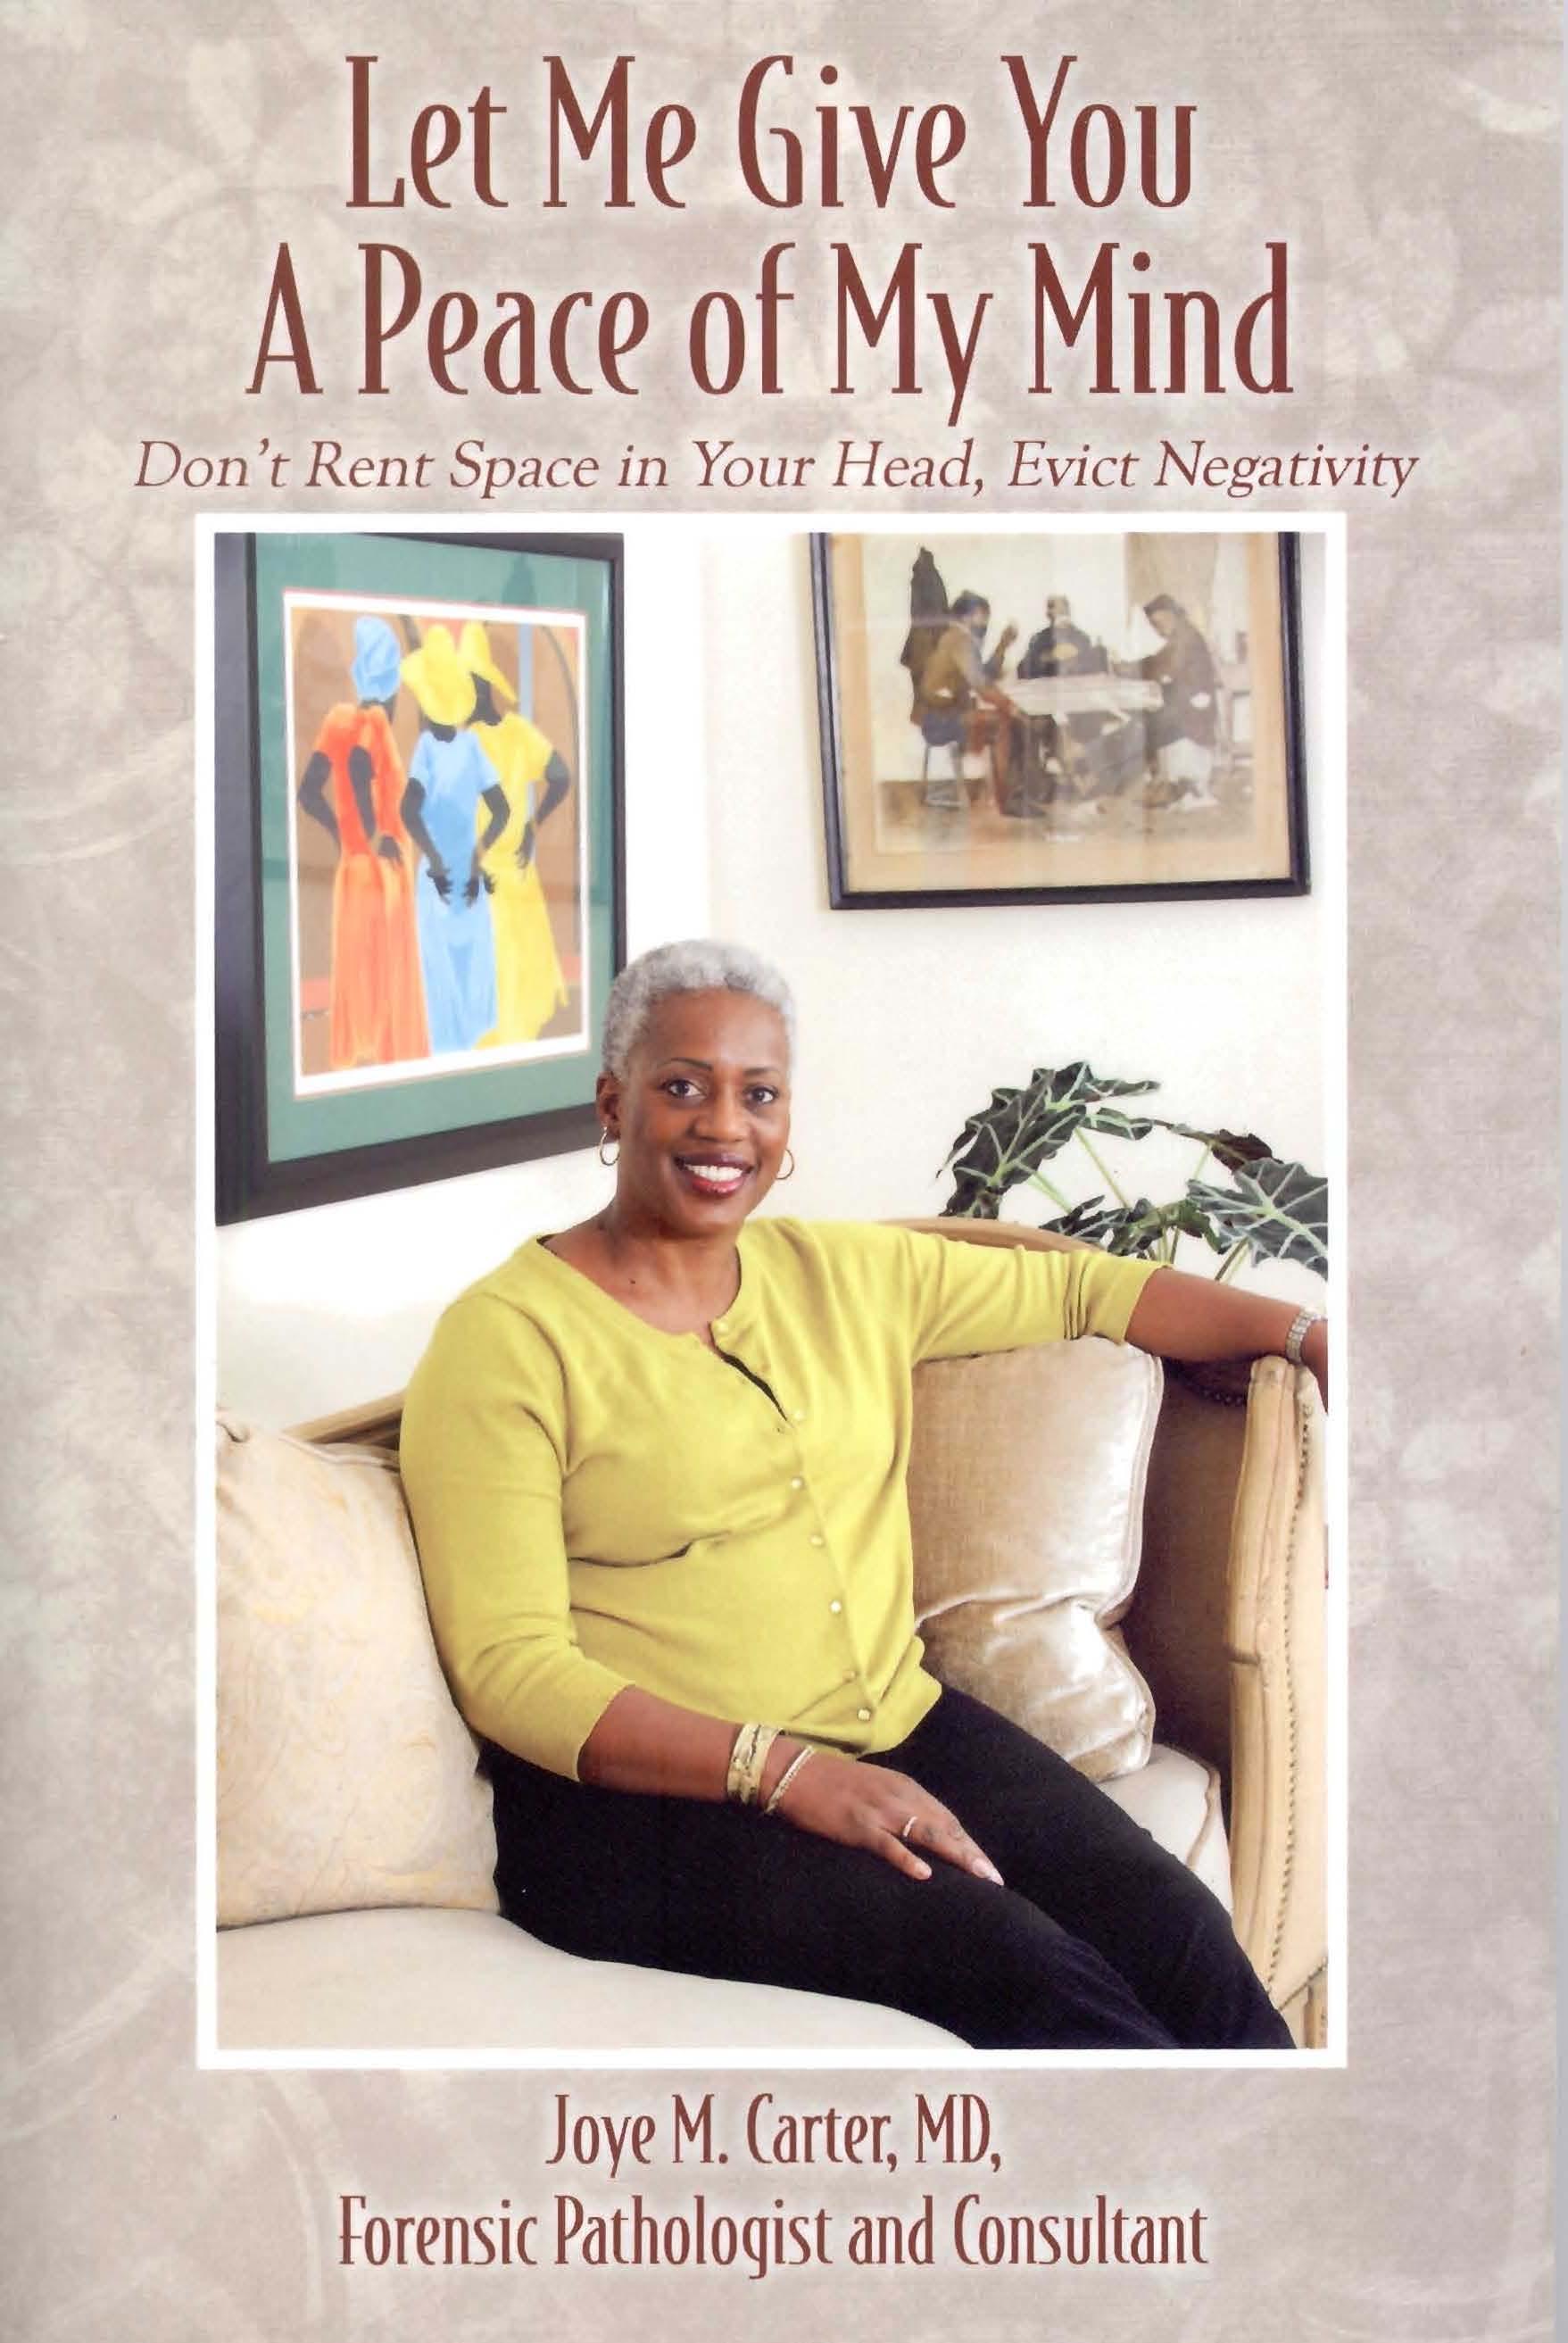 DR. JOYE M. CARTER PUBLISHES INSPIRATIONAL THIRD BOOK